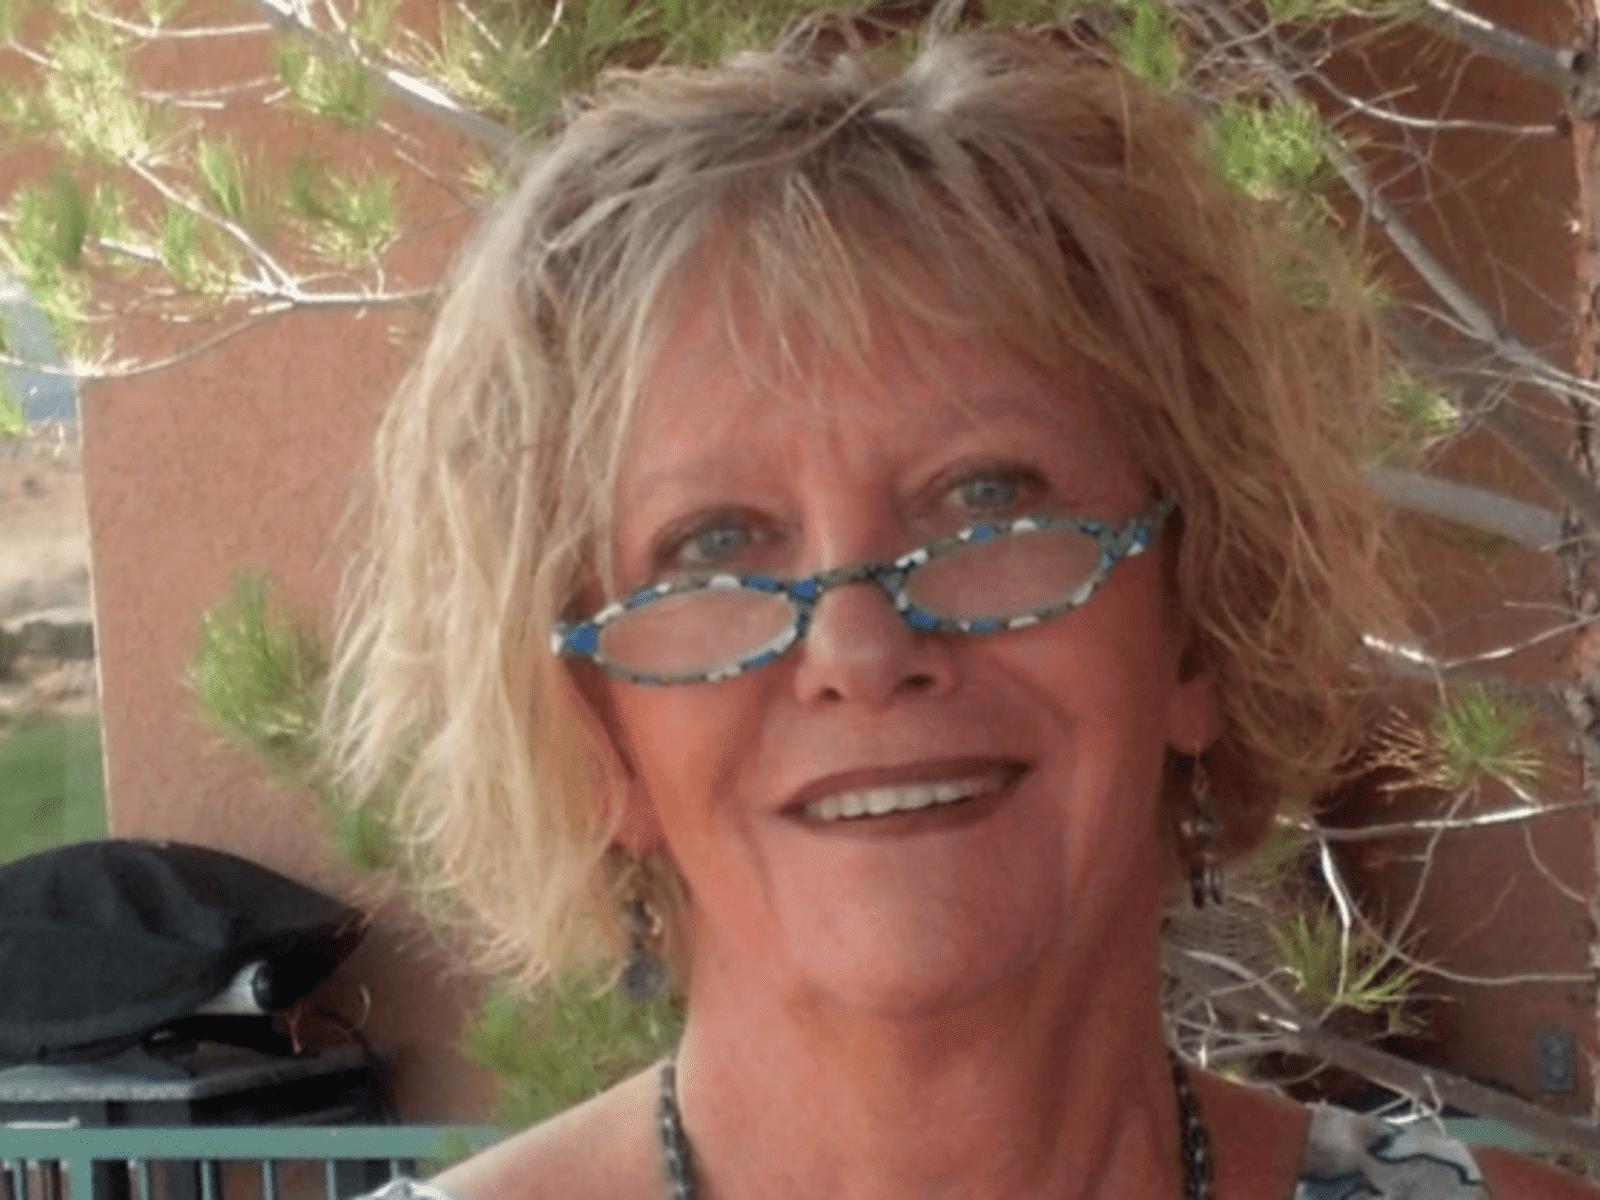 Katherine from Mesquite, Nevada, United States